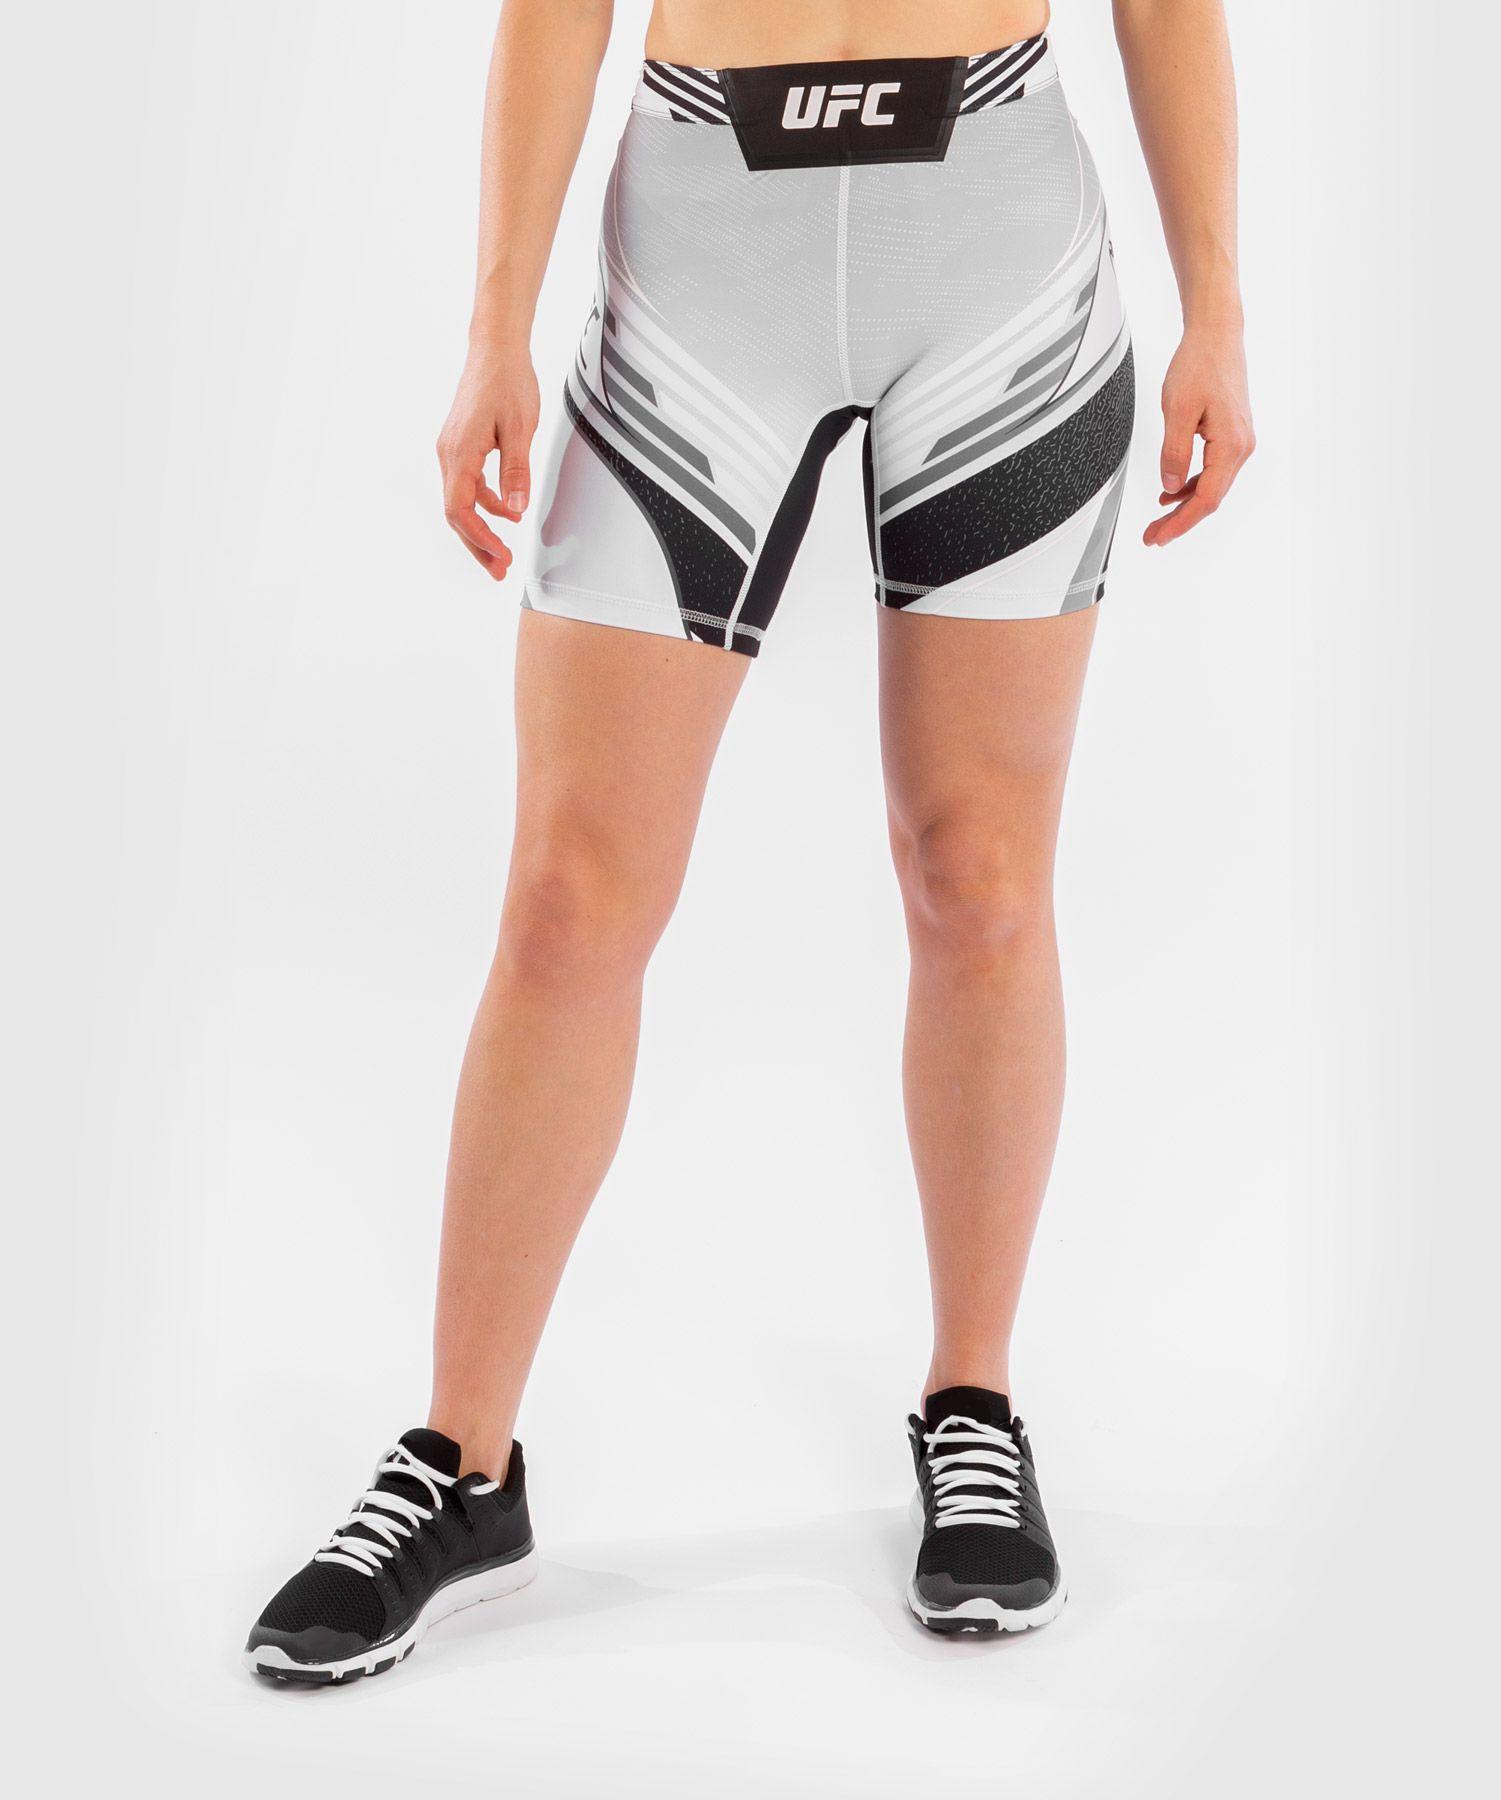 UFC Venum Authentic Fight Night Women's Vale Tudo Shorts - Long Fit - White